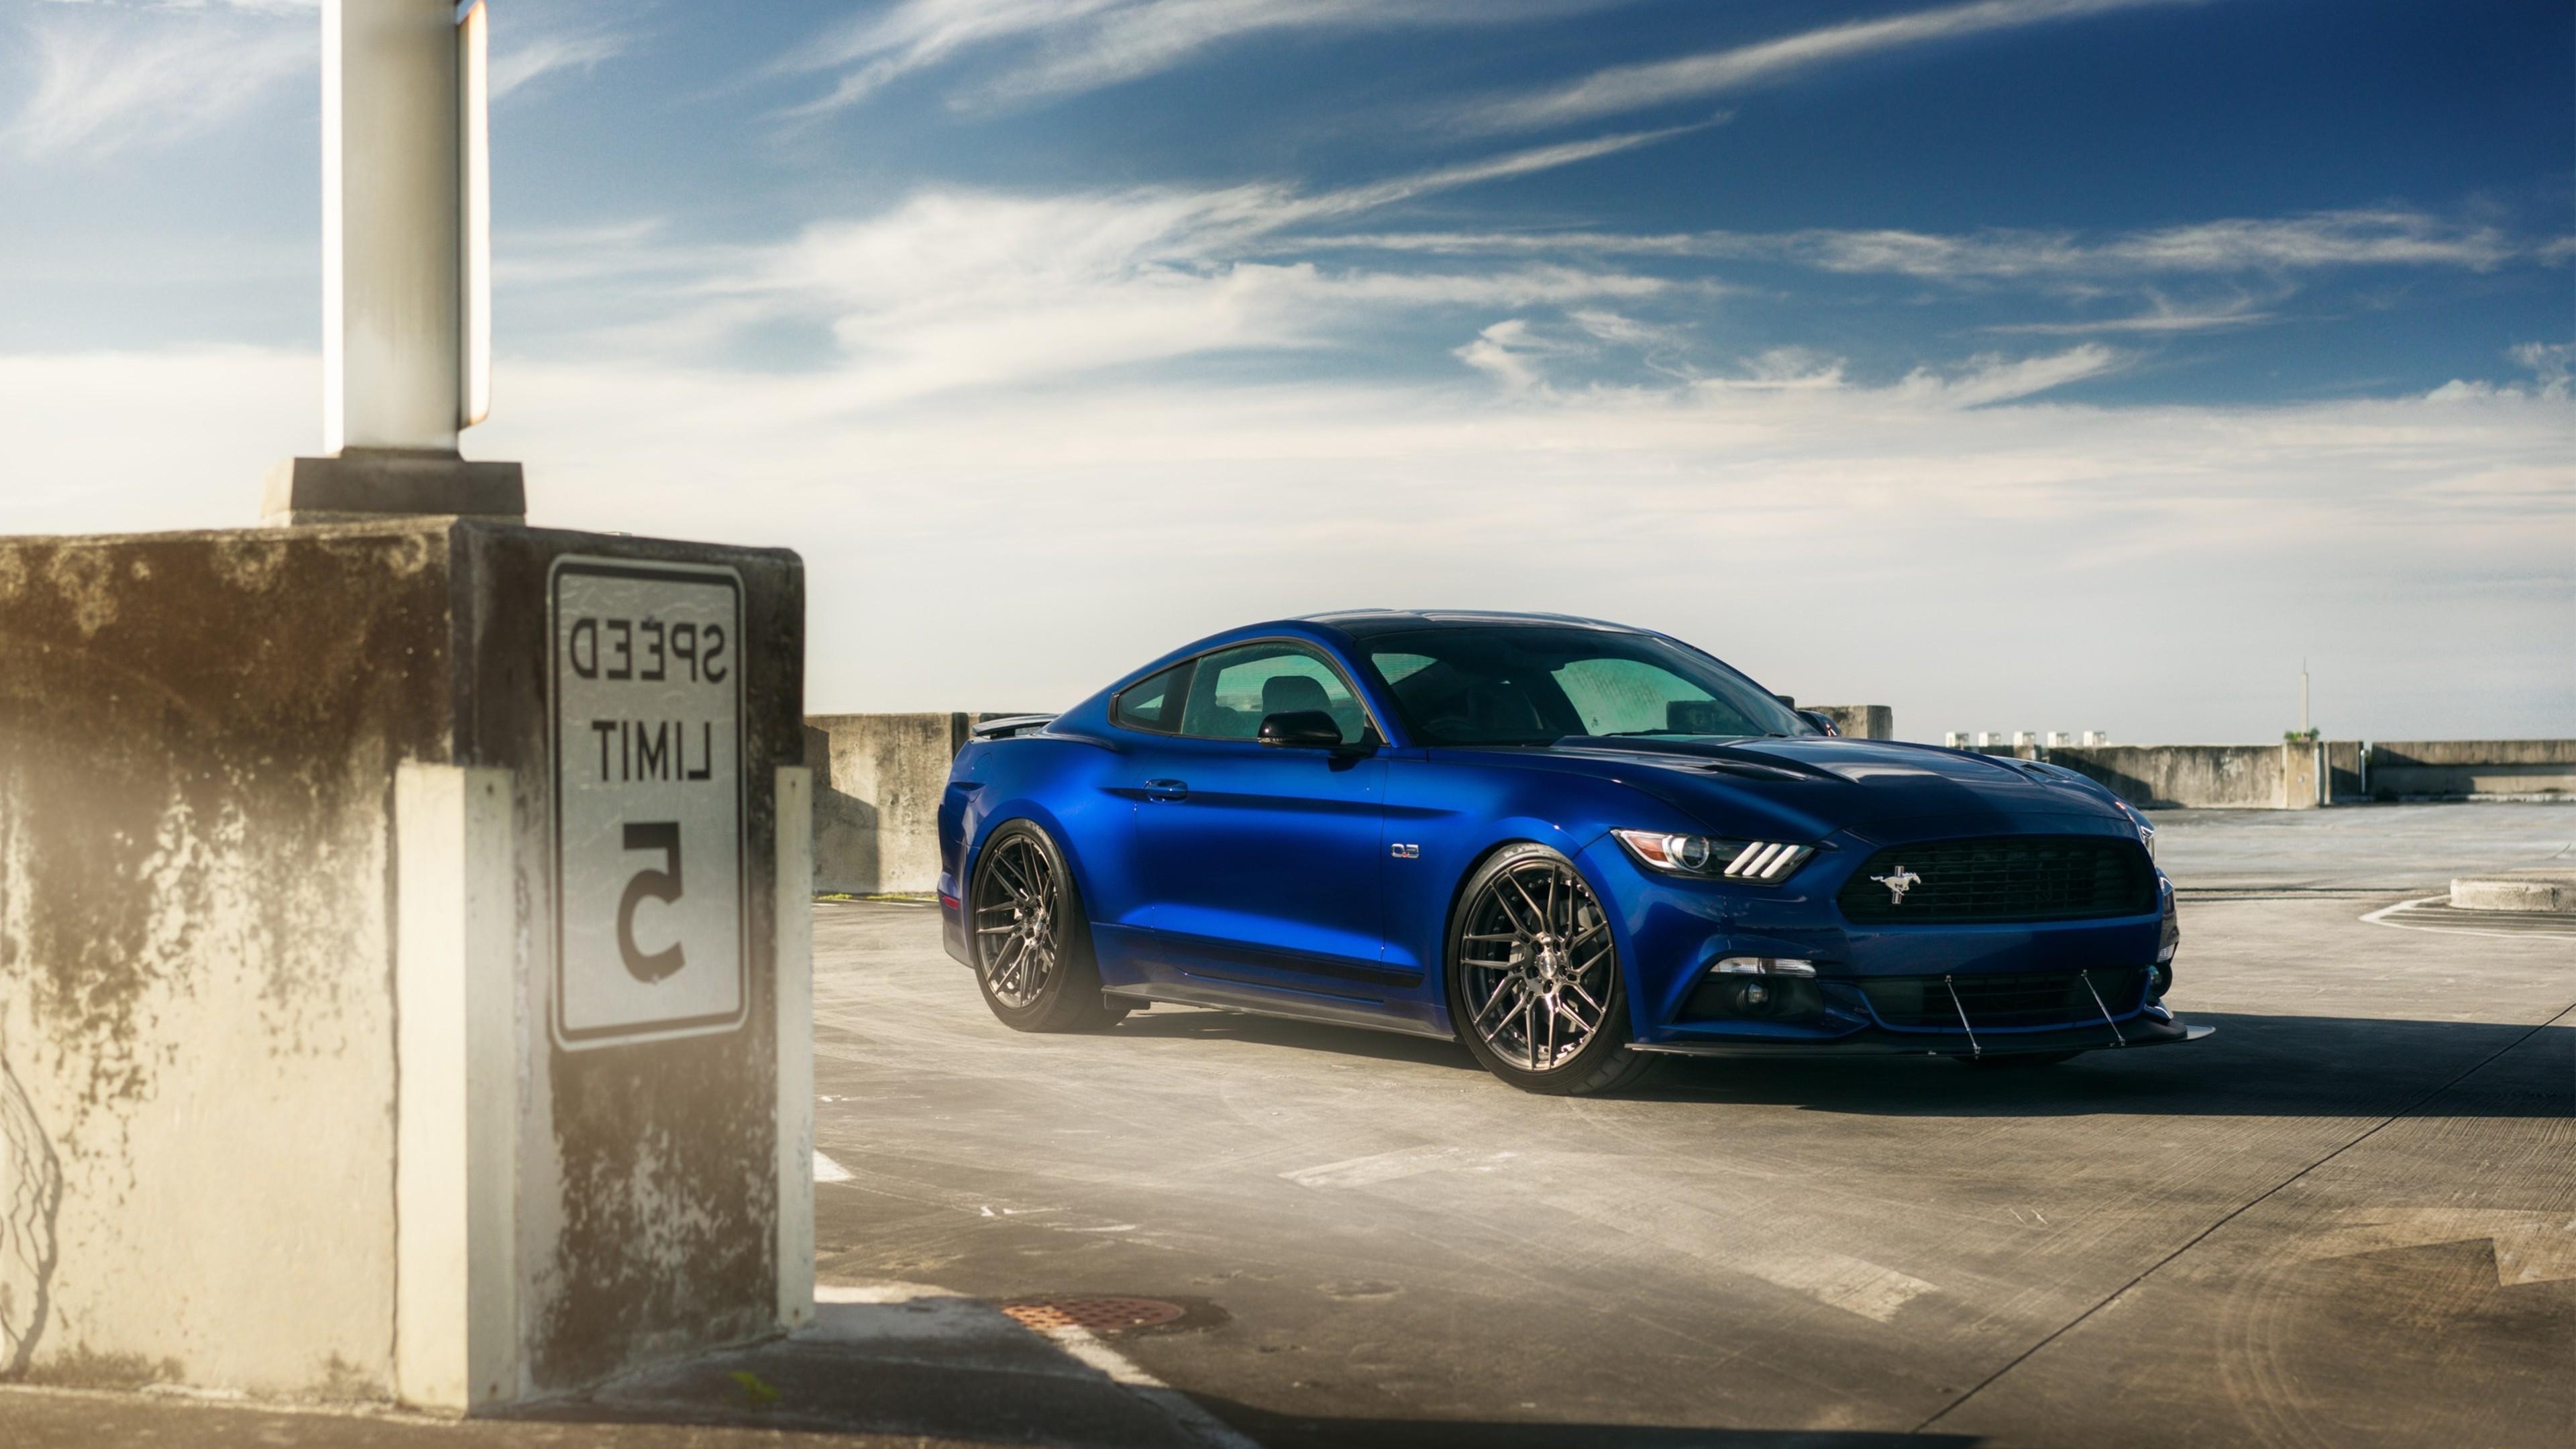 Res: 3840x2160, Adv Wheels Ford Mustang V8